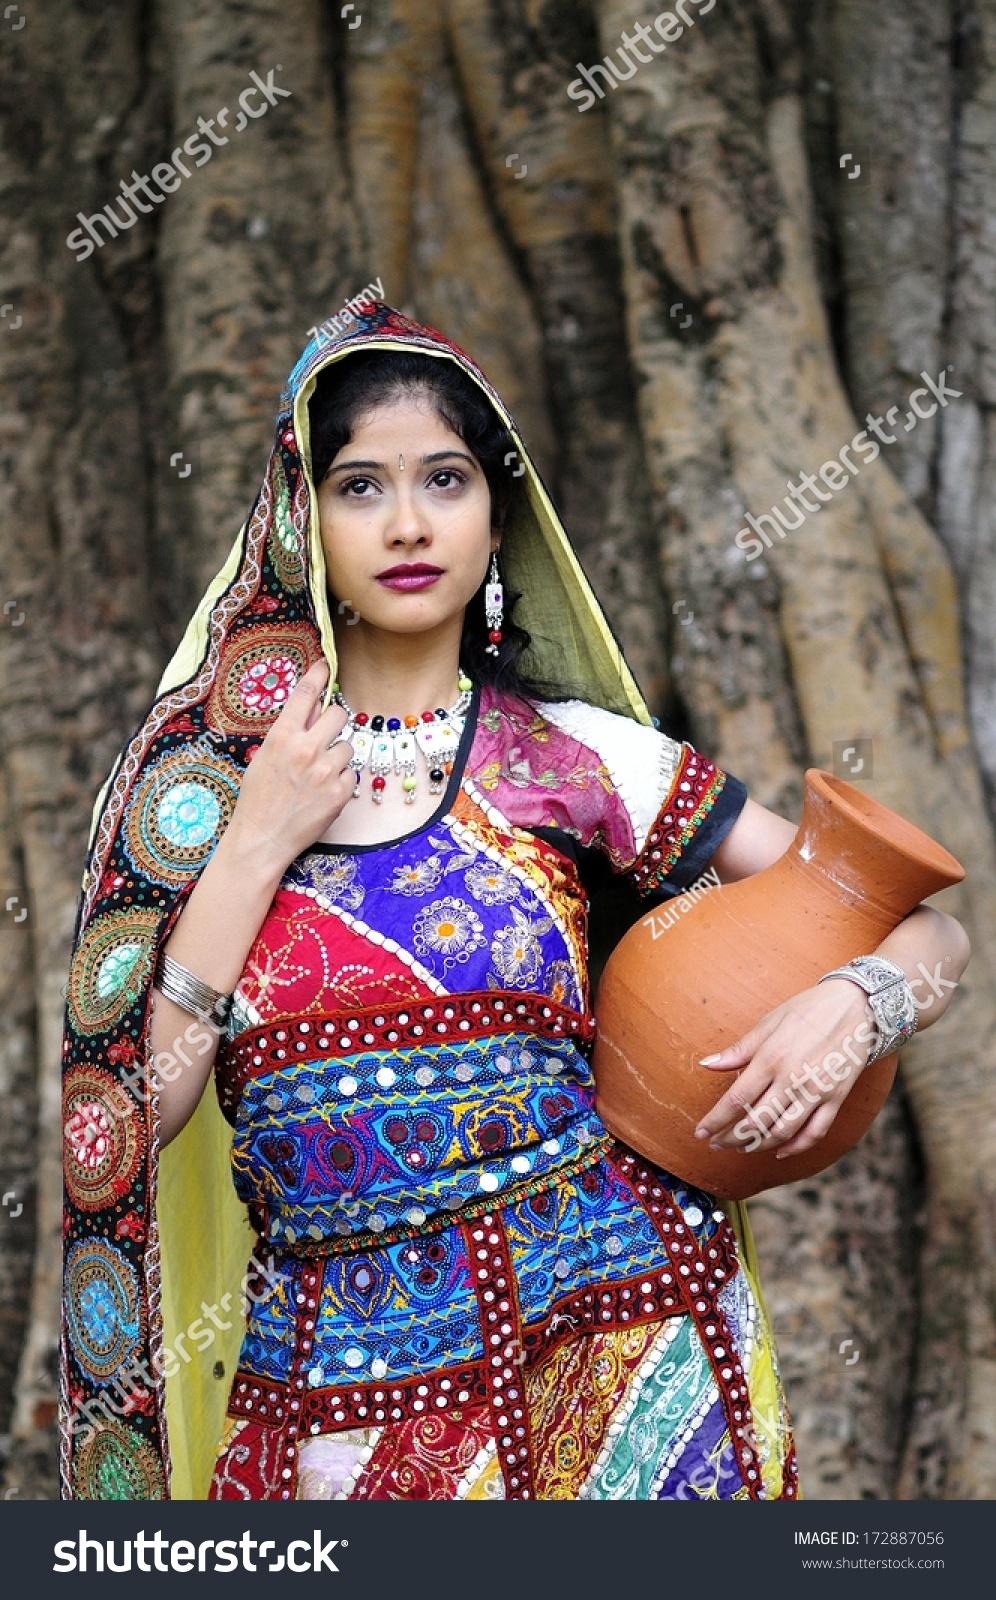 Gujarat dress pictures